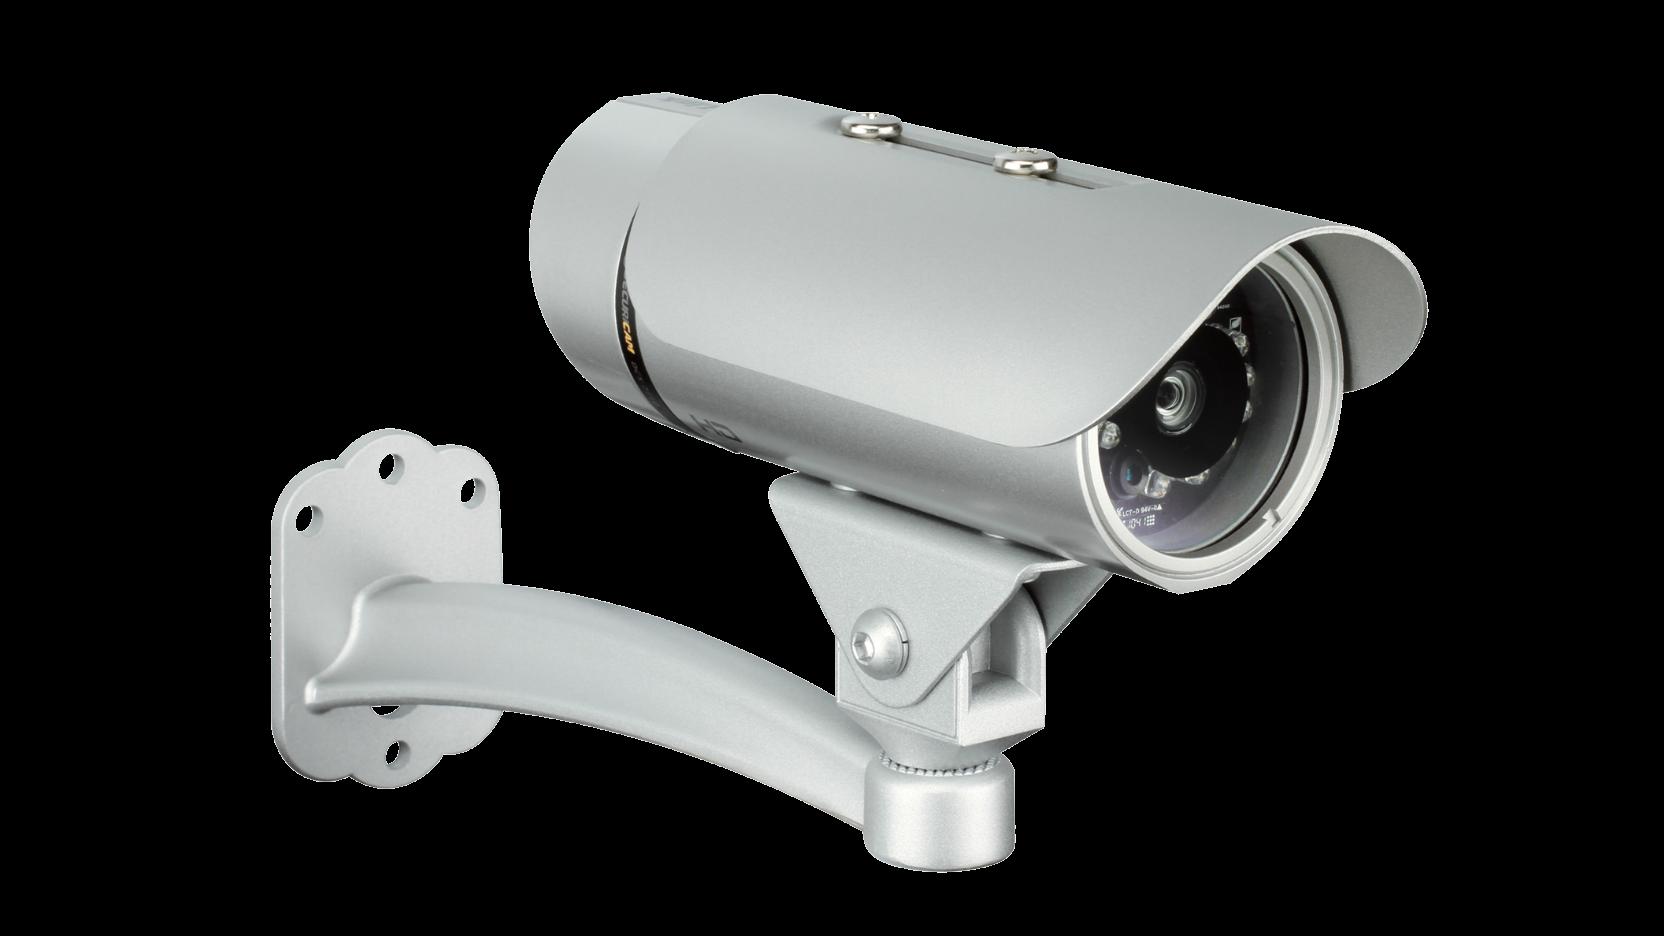 2 MP HD Outdoor Bullet IP Camera |